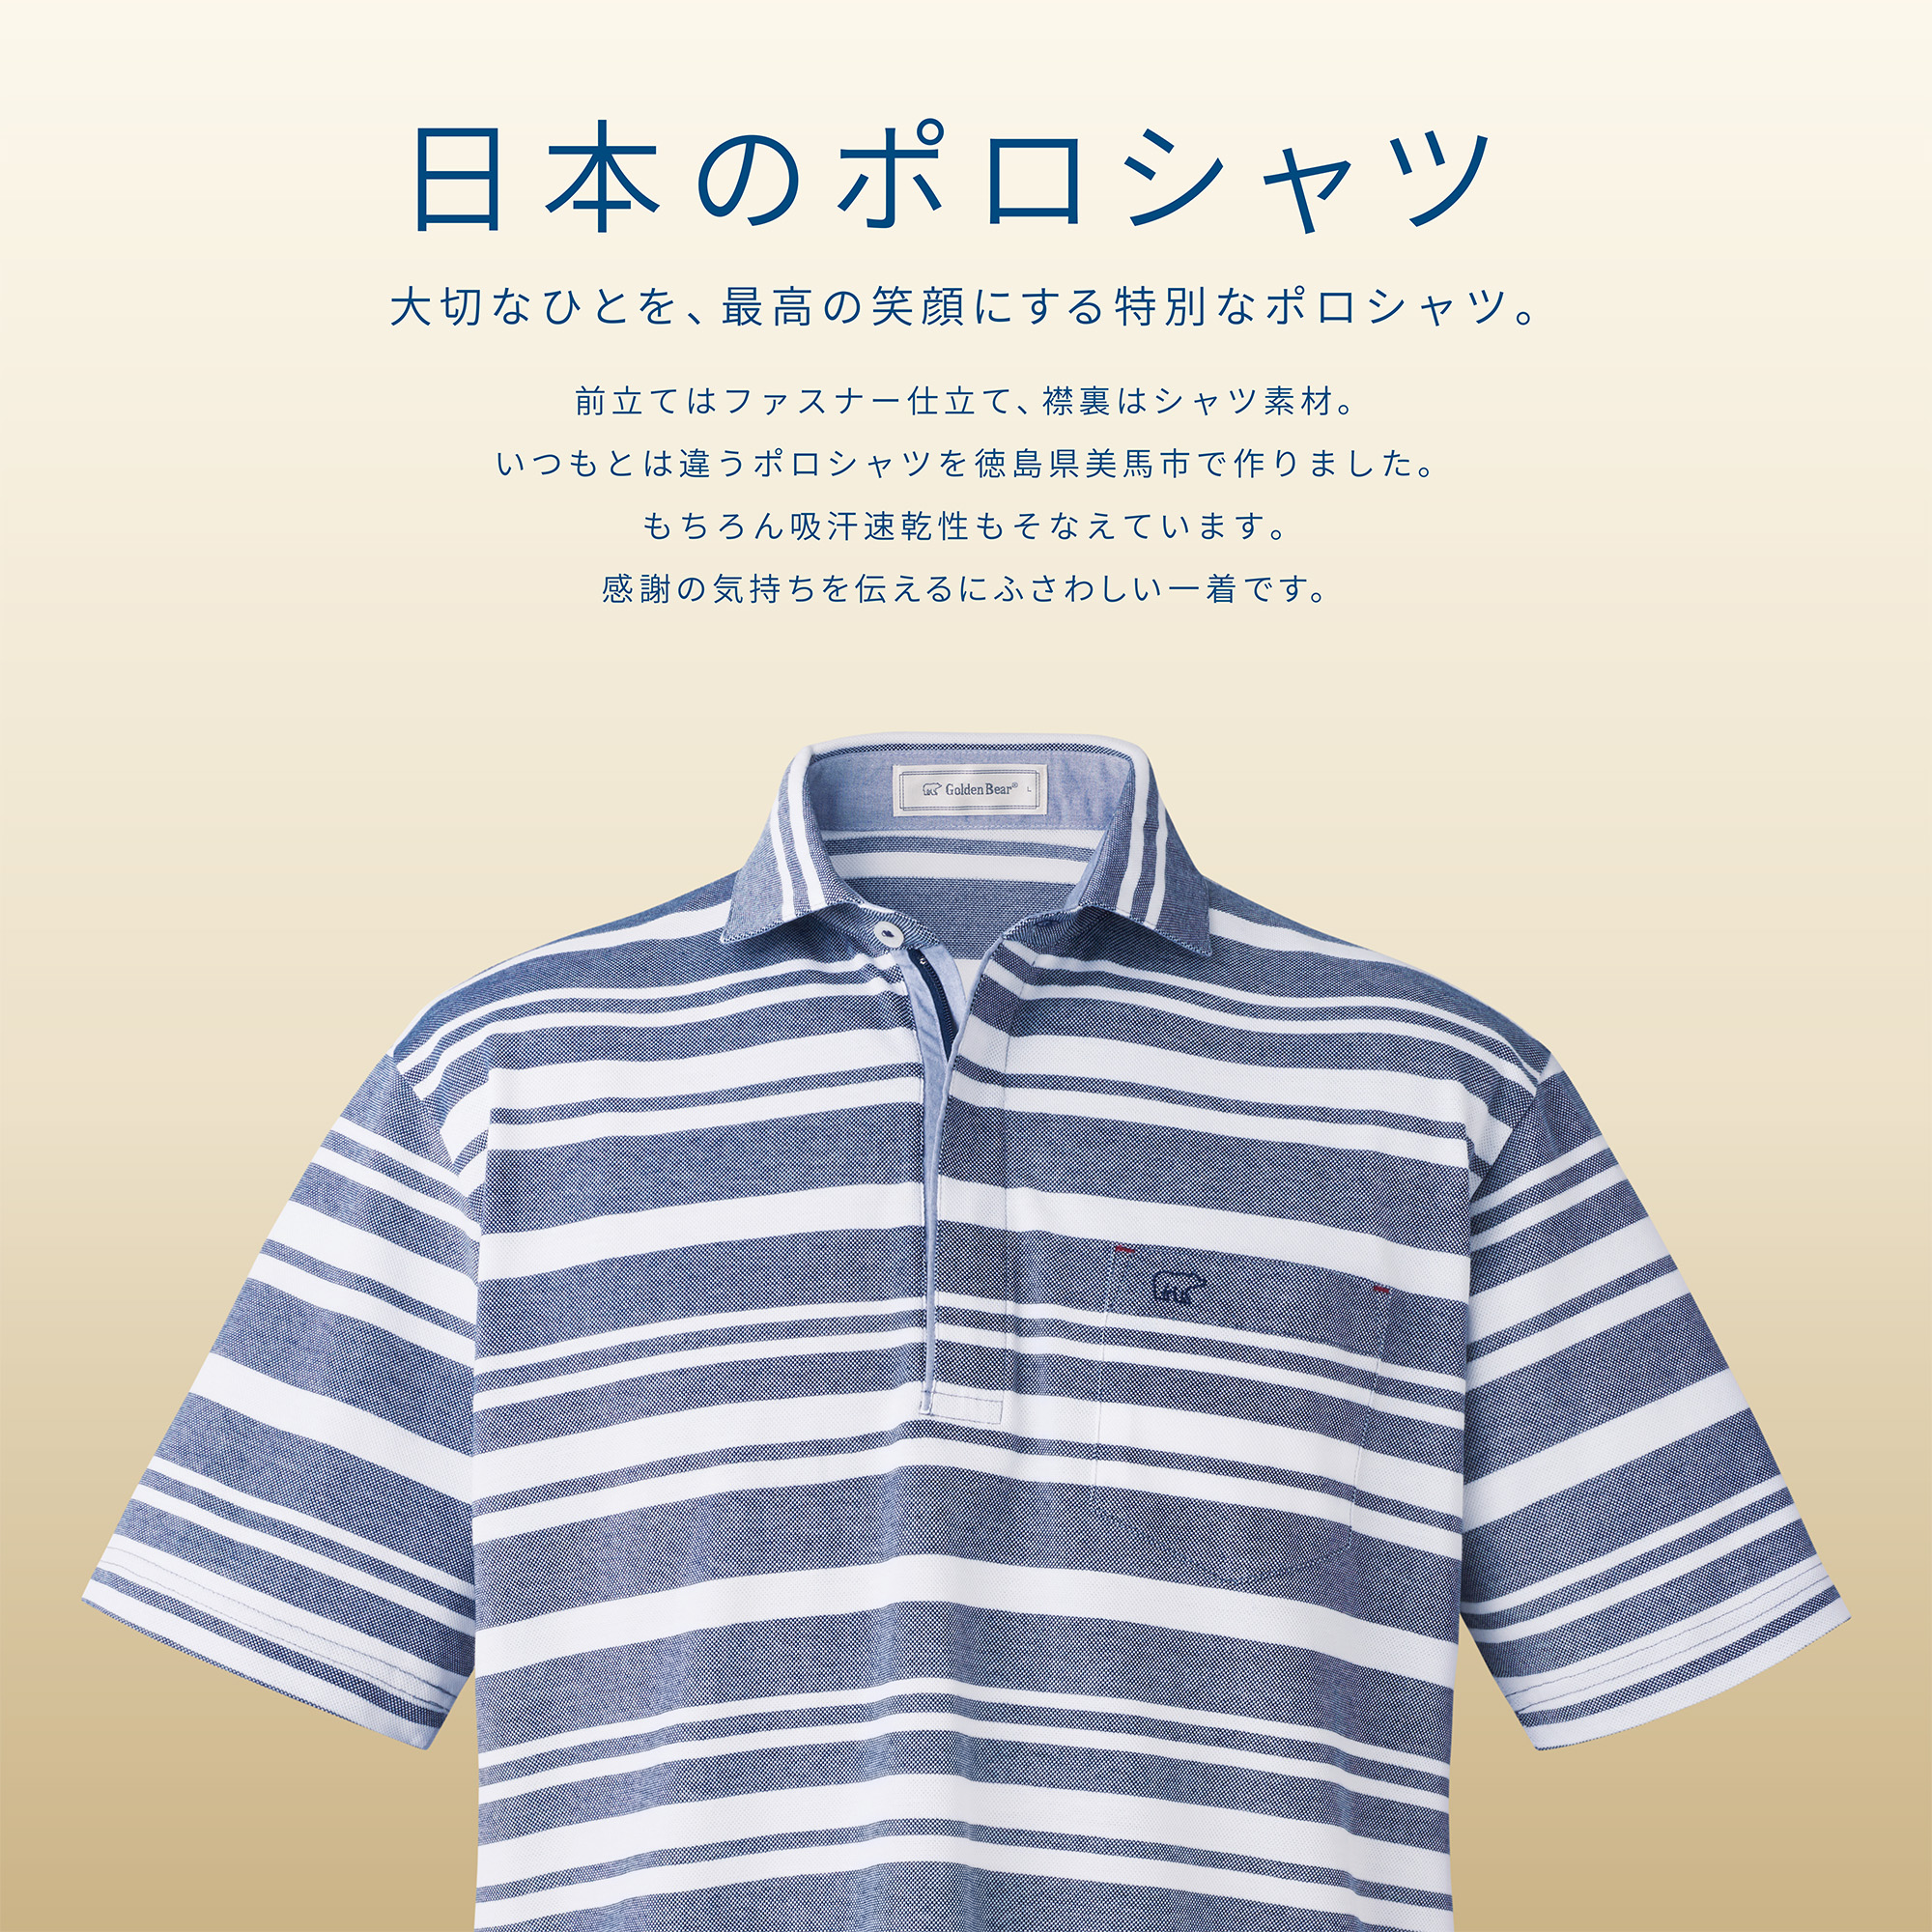 【Golden Bear Mens】<br/>日本のポロシャツ 新聞広告掲載のお知らせ